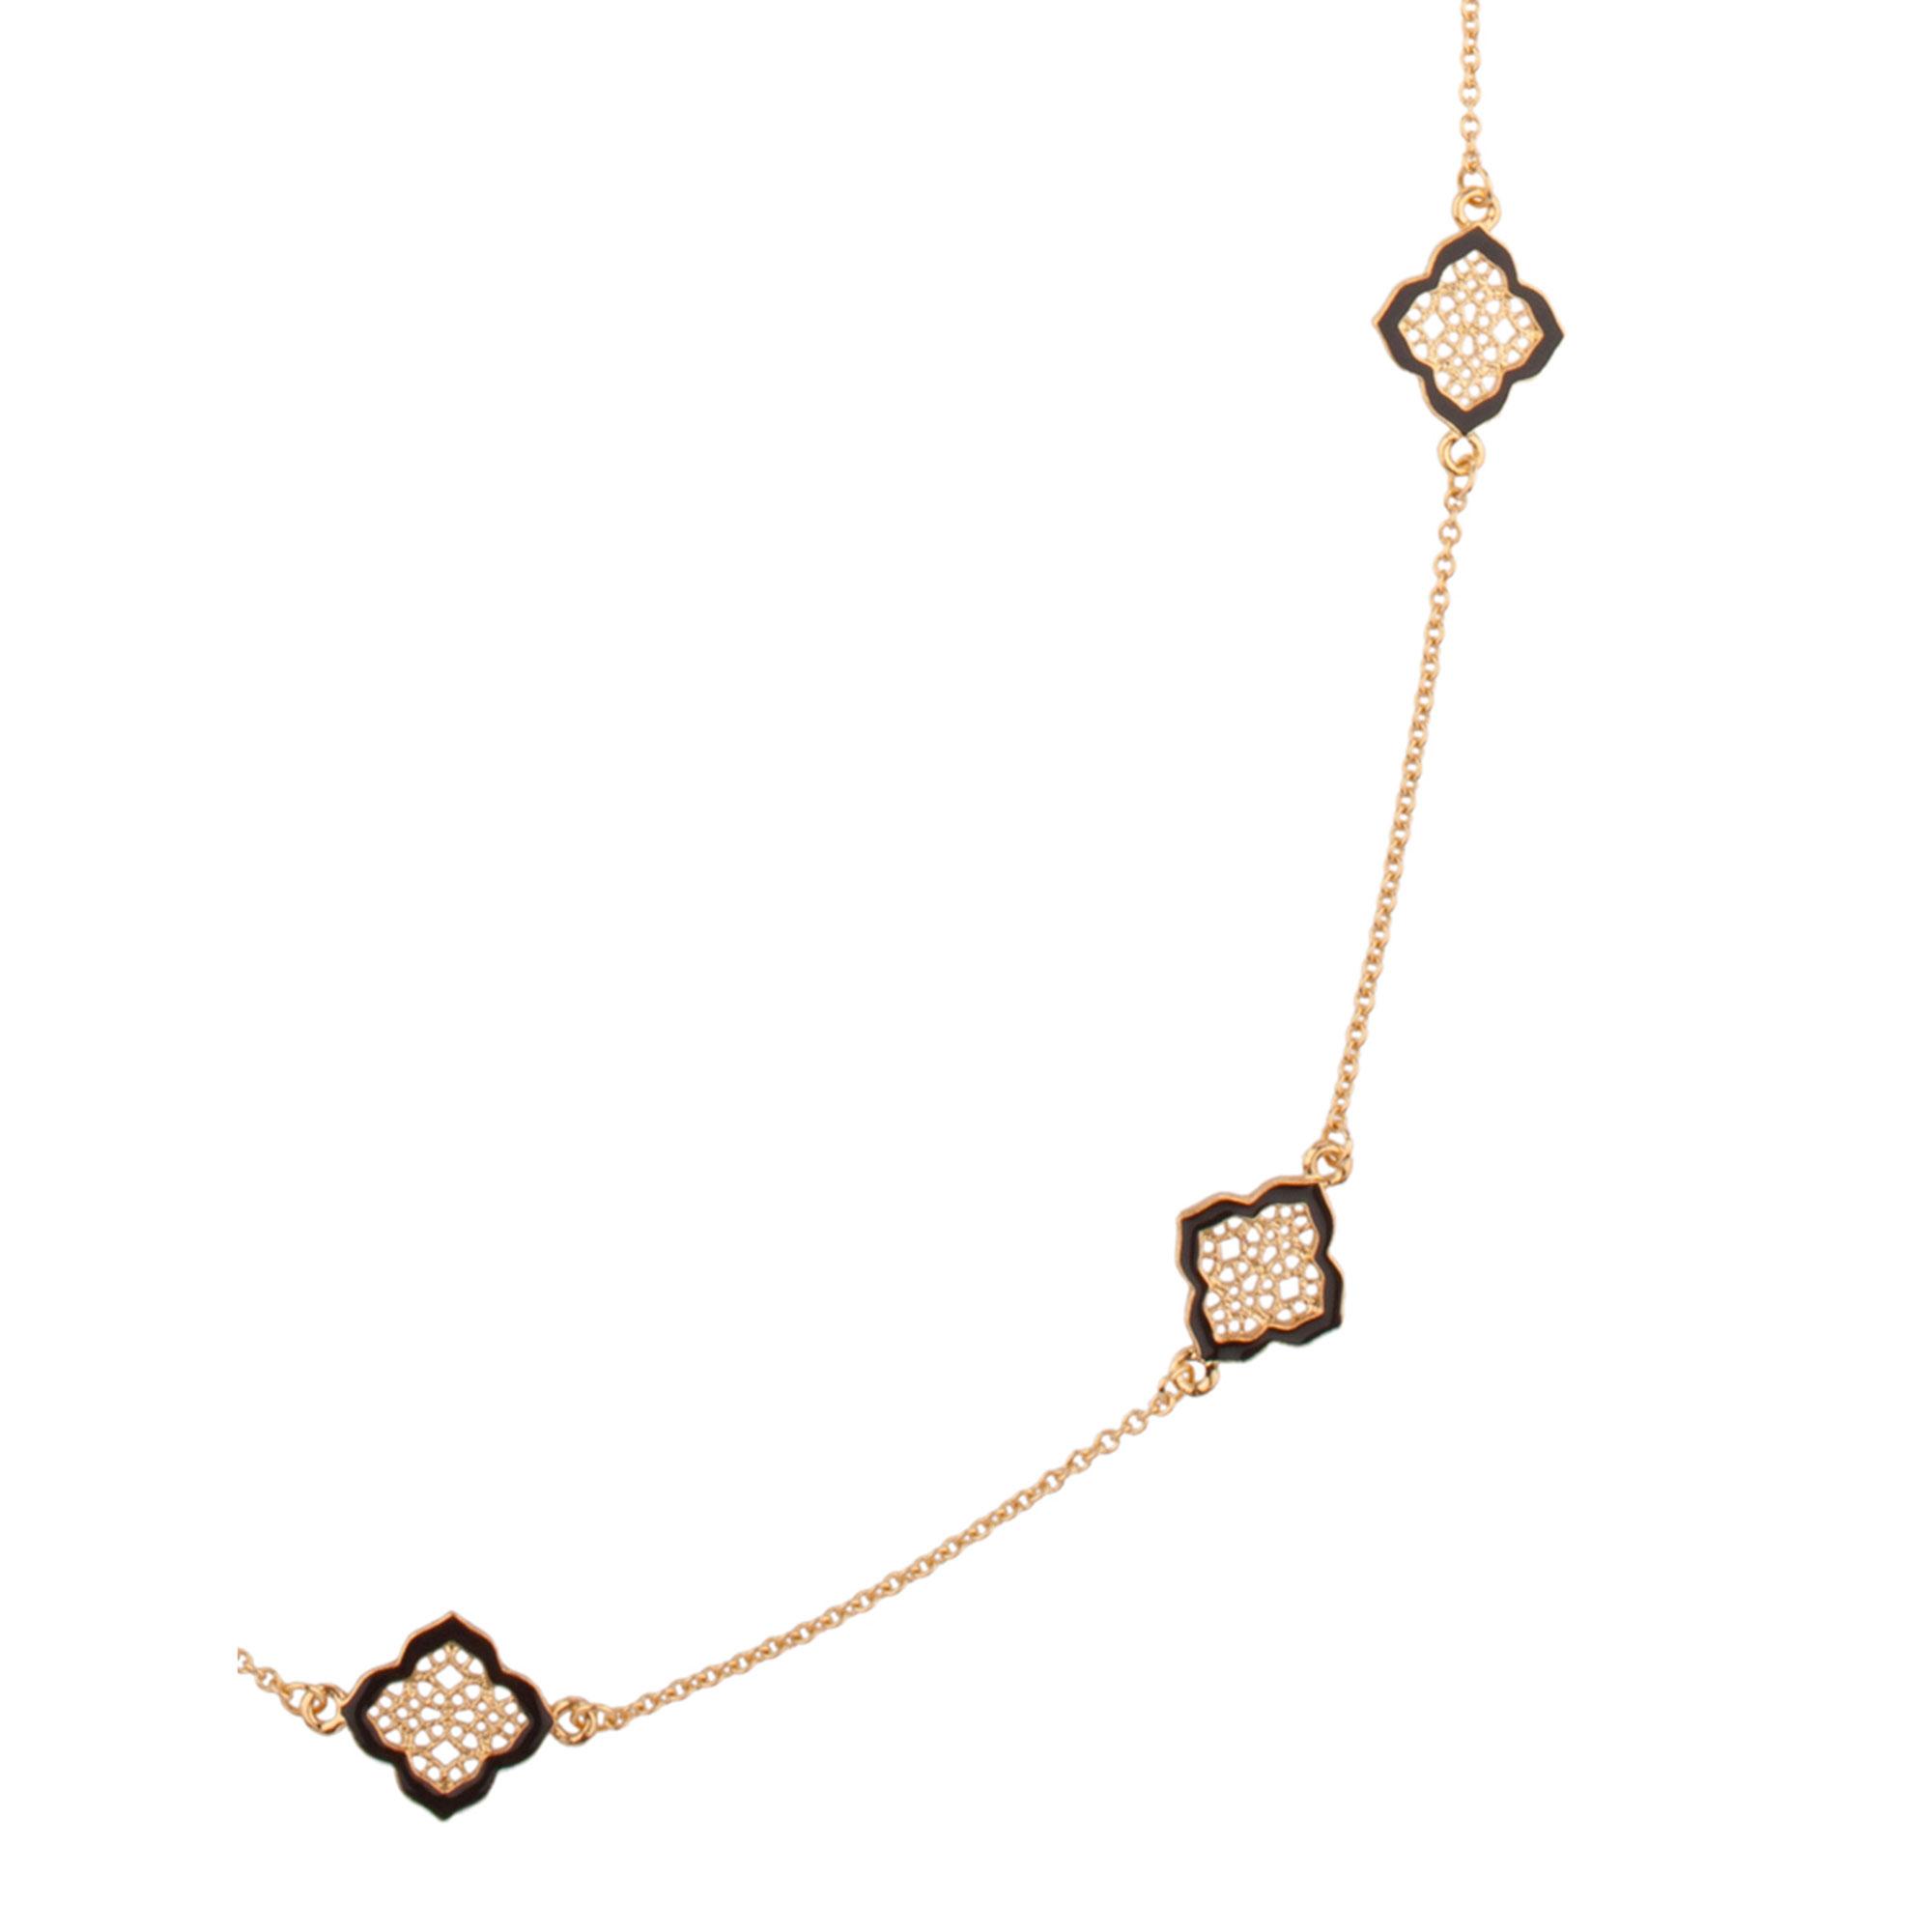 Gold and Enamel Pendant